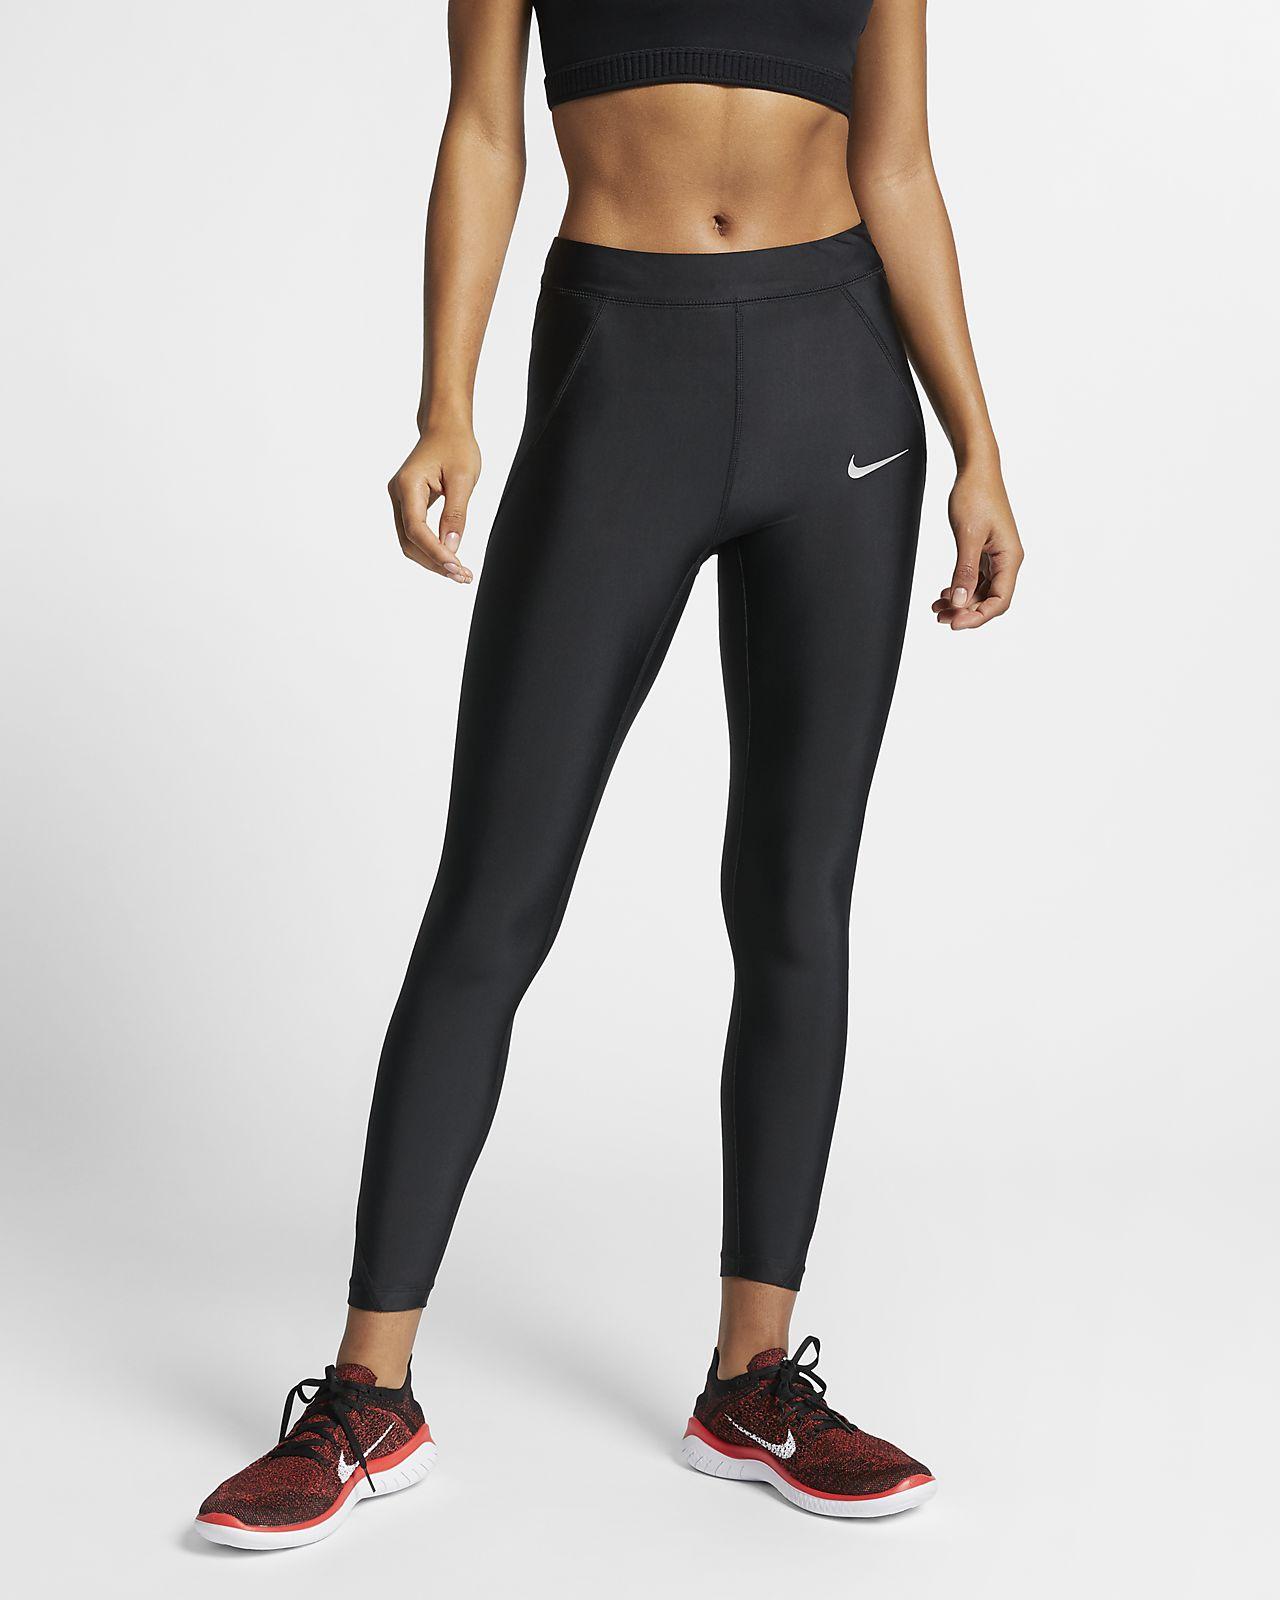 Nike Speed Malles de 7/8 - Dona